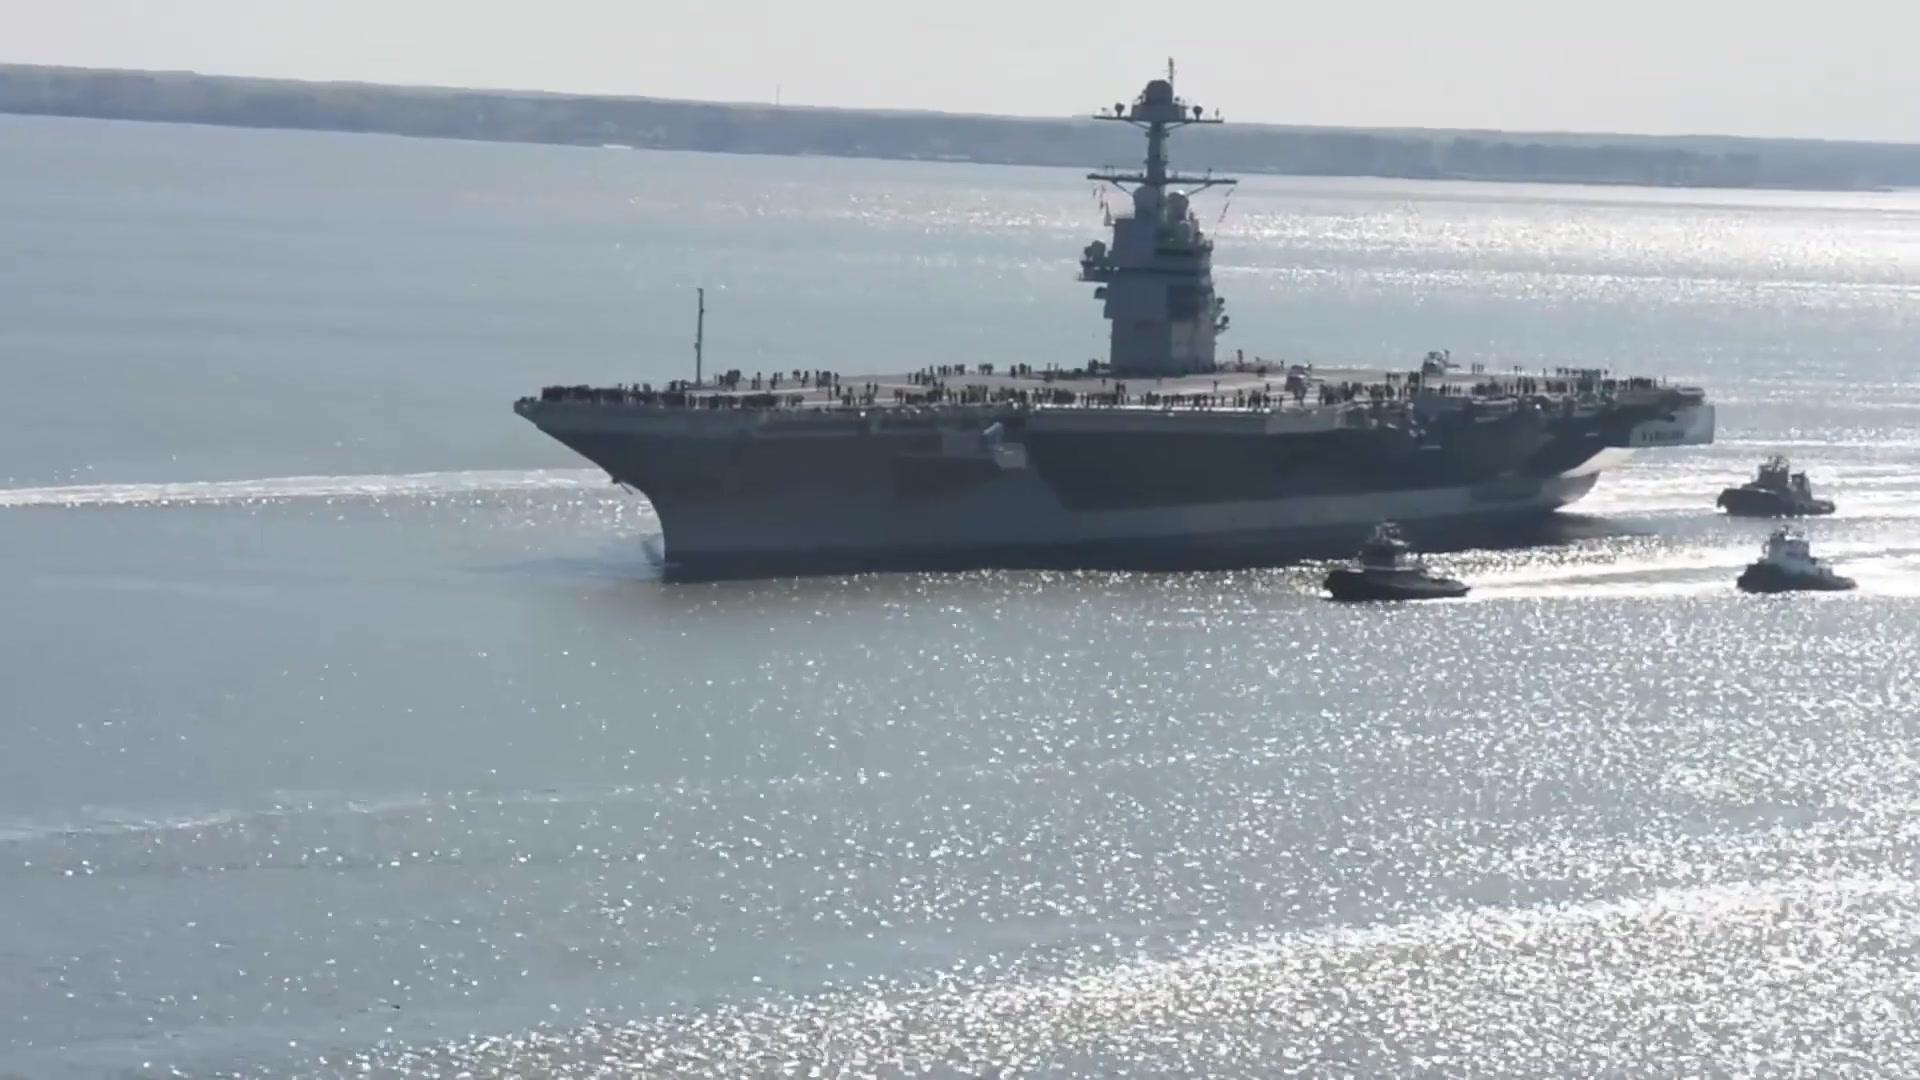 Future Uss Gerald R Ford Underway For Builder S Sea Trials